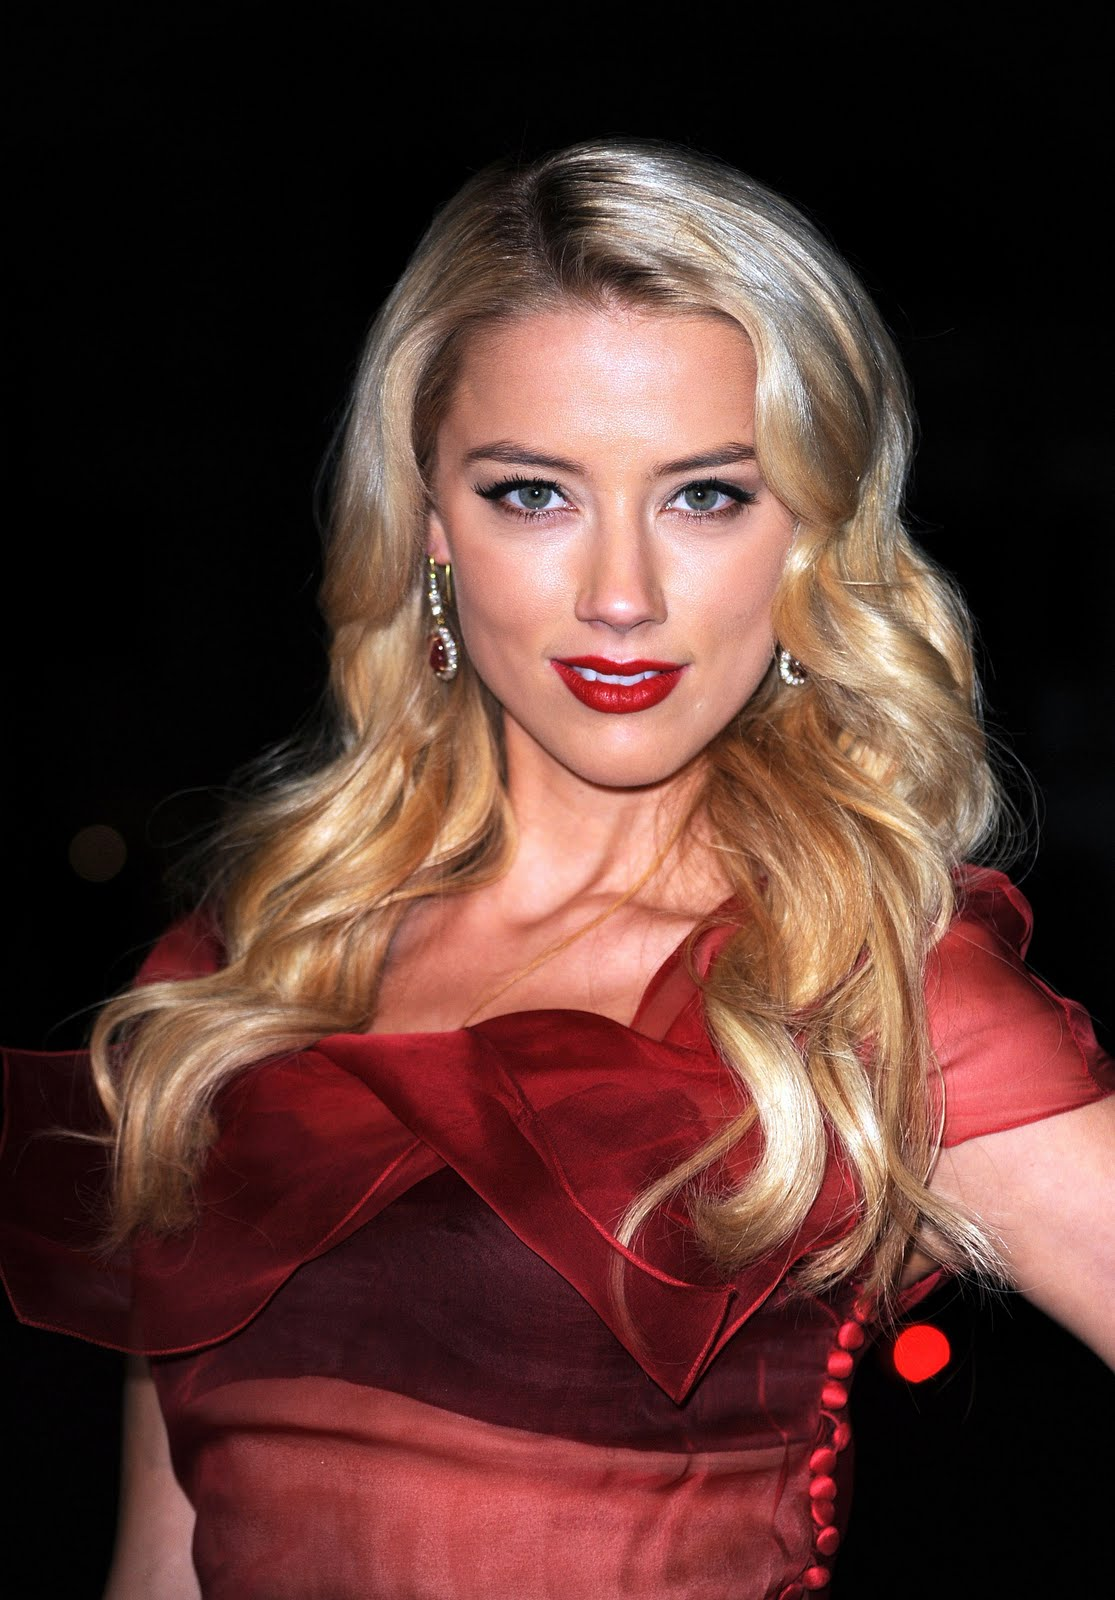 Wallpaper World: Amber Heard Beautiful Photo by The Art of ...